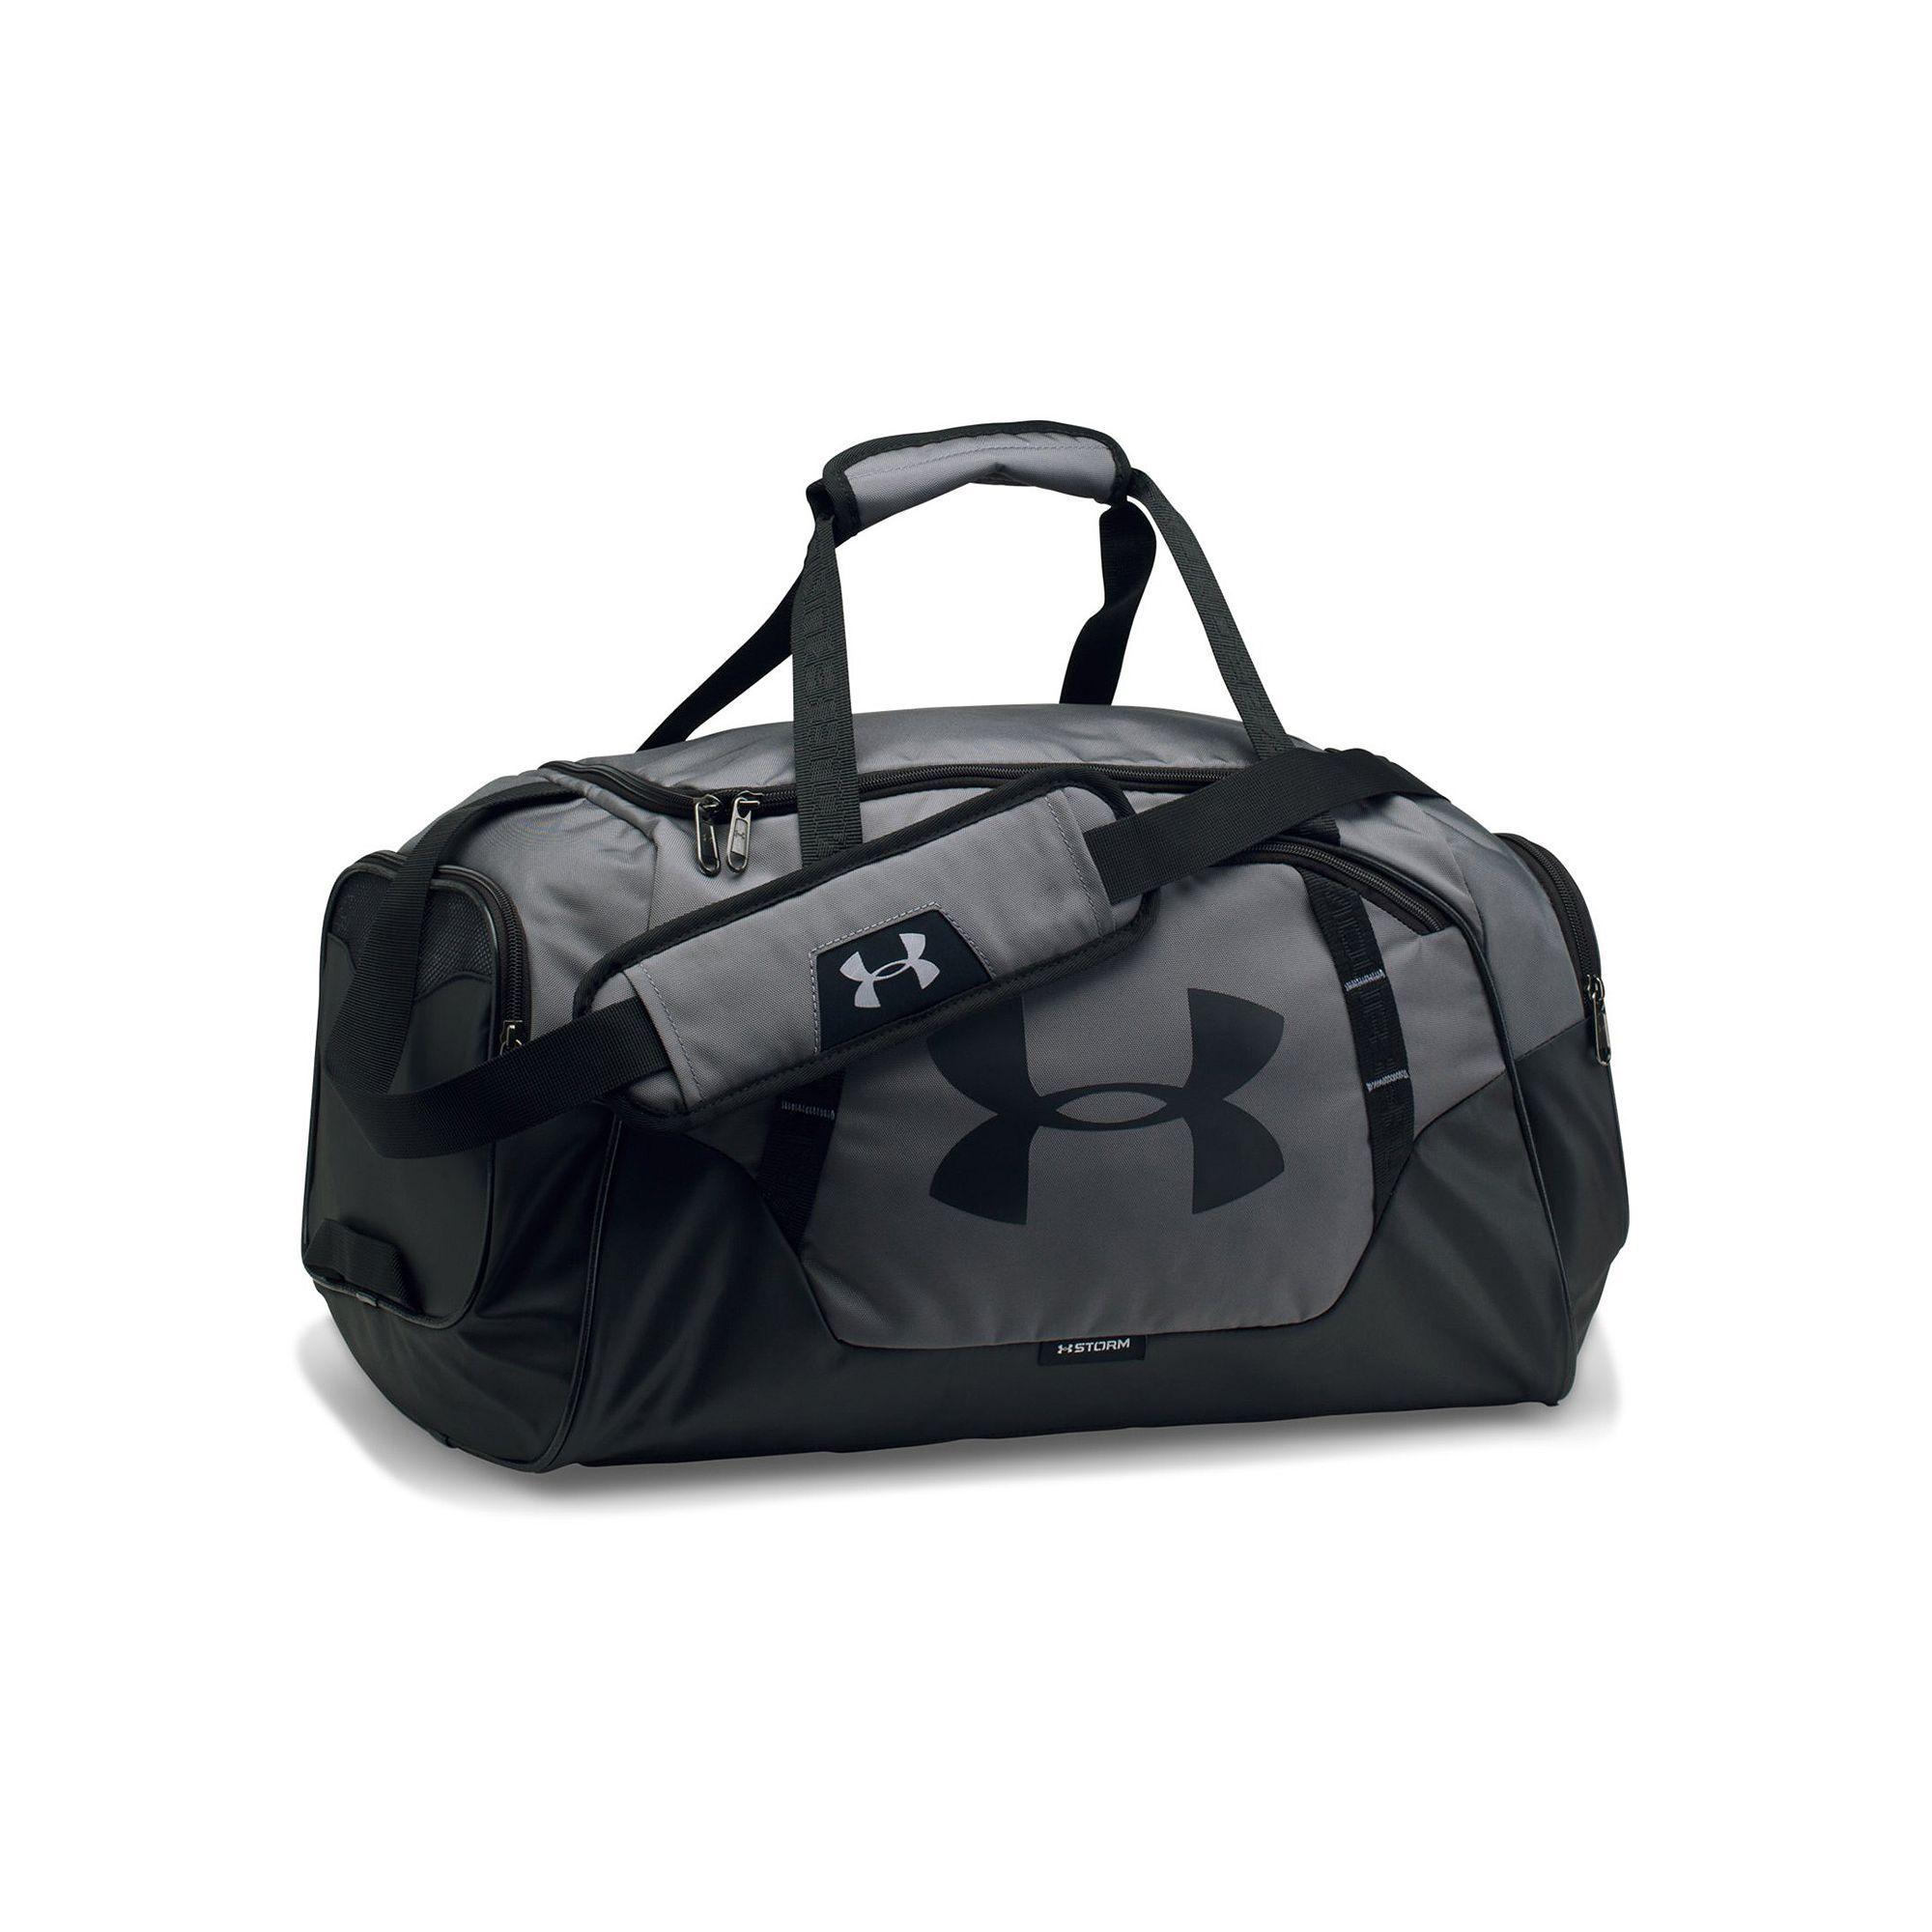 2a334dec289d Under Armour Undeniable 3.0 Small Duffel Bag